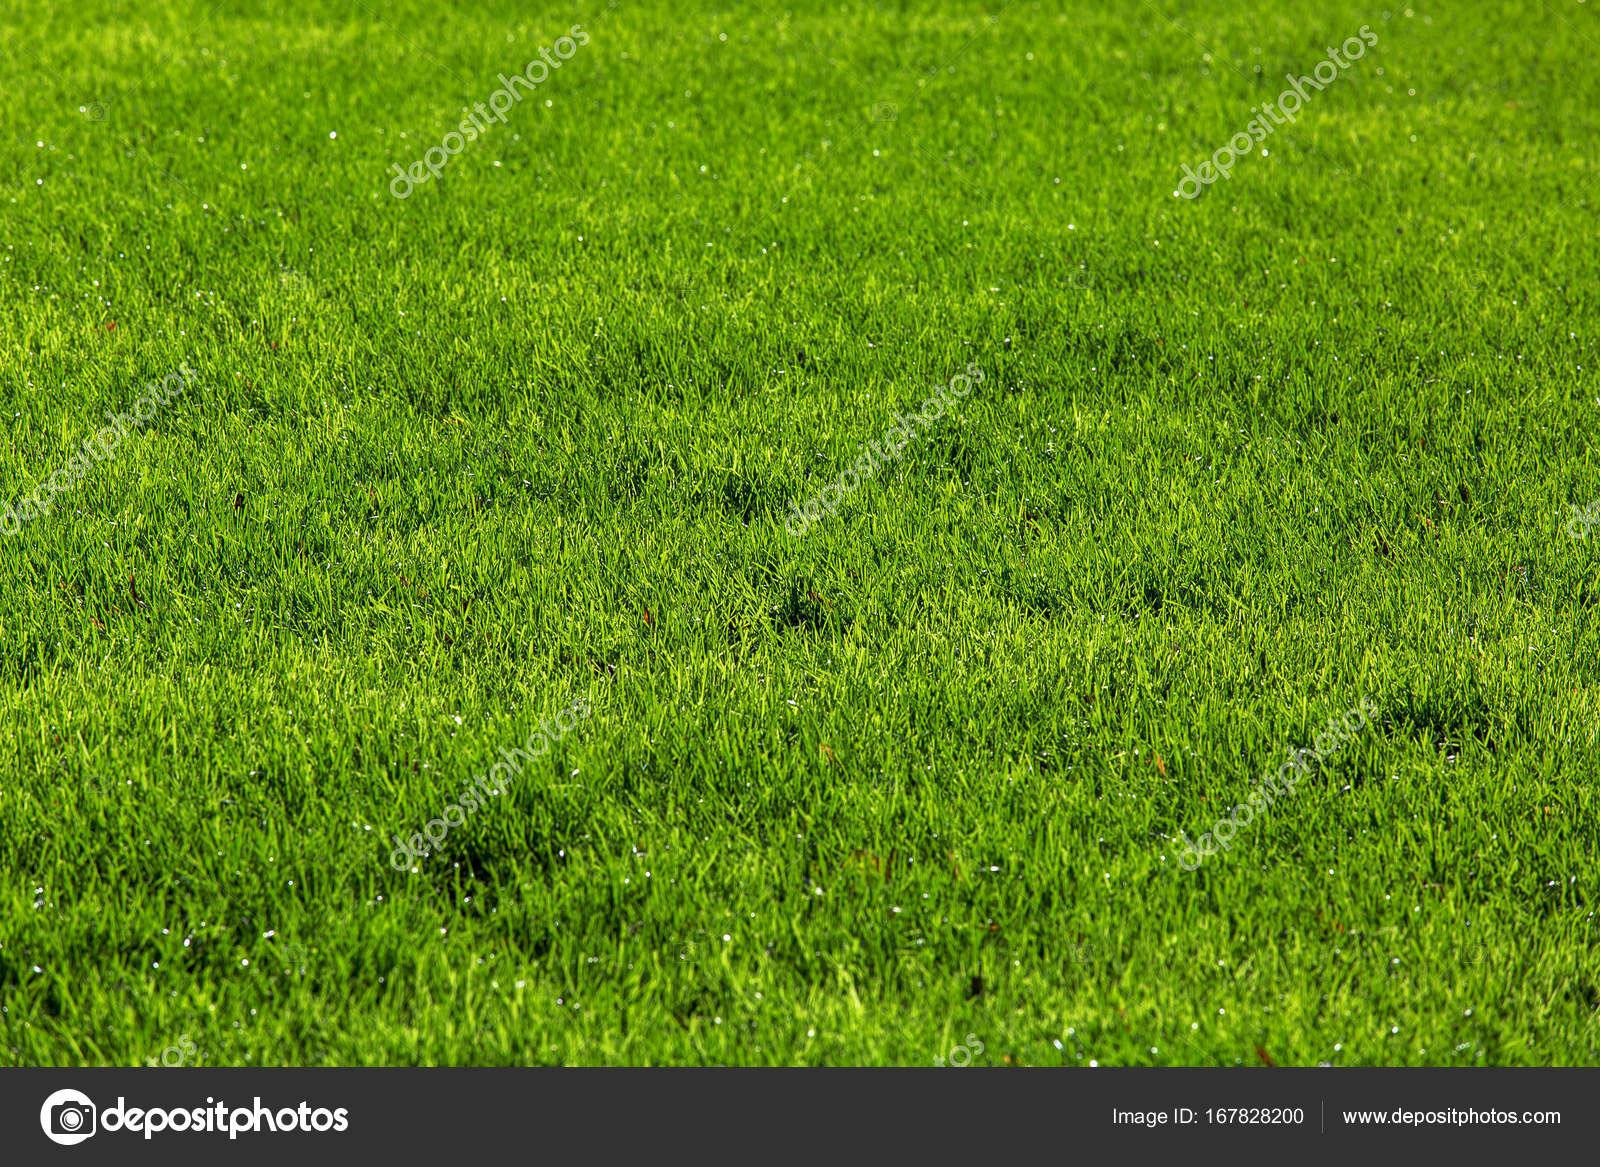 Lo Sfondo Verde Erba Foto Stock Bespaliya 167828200